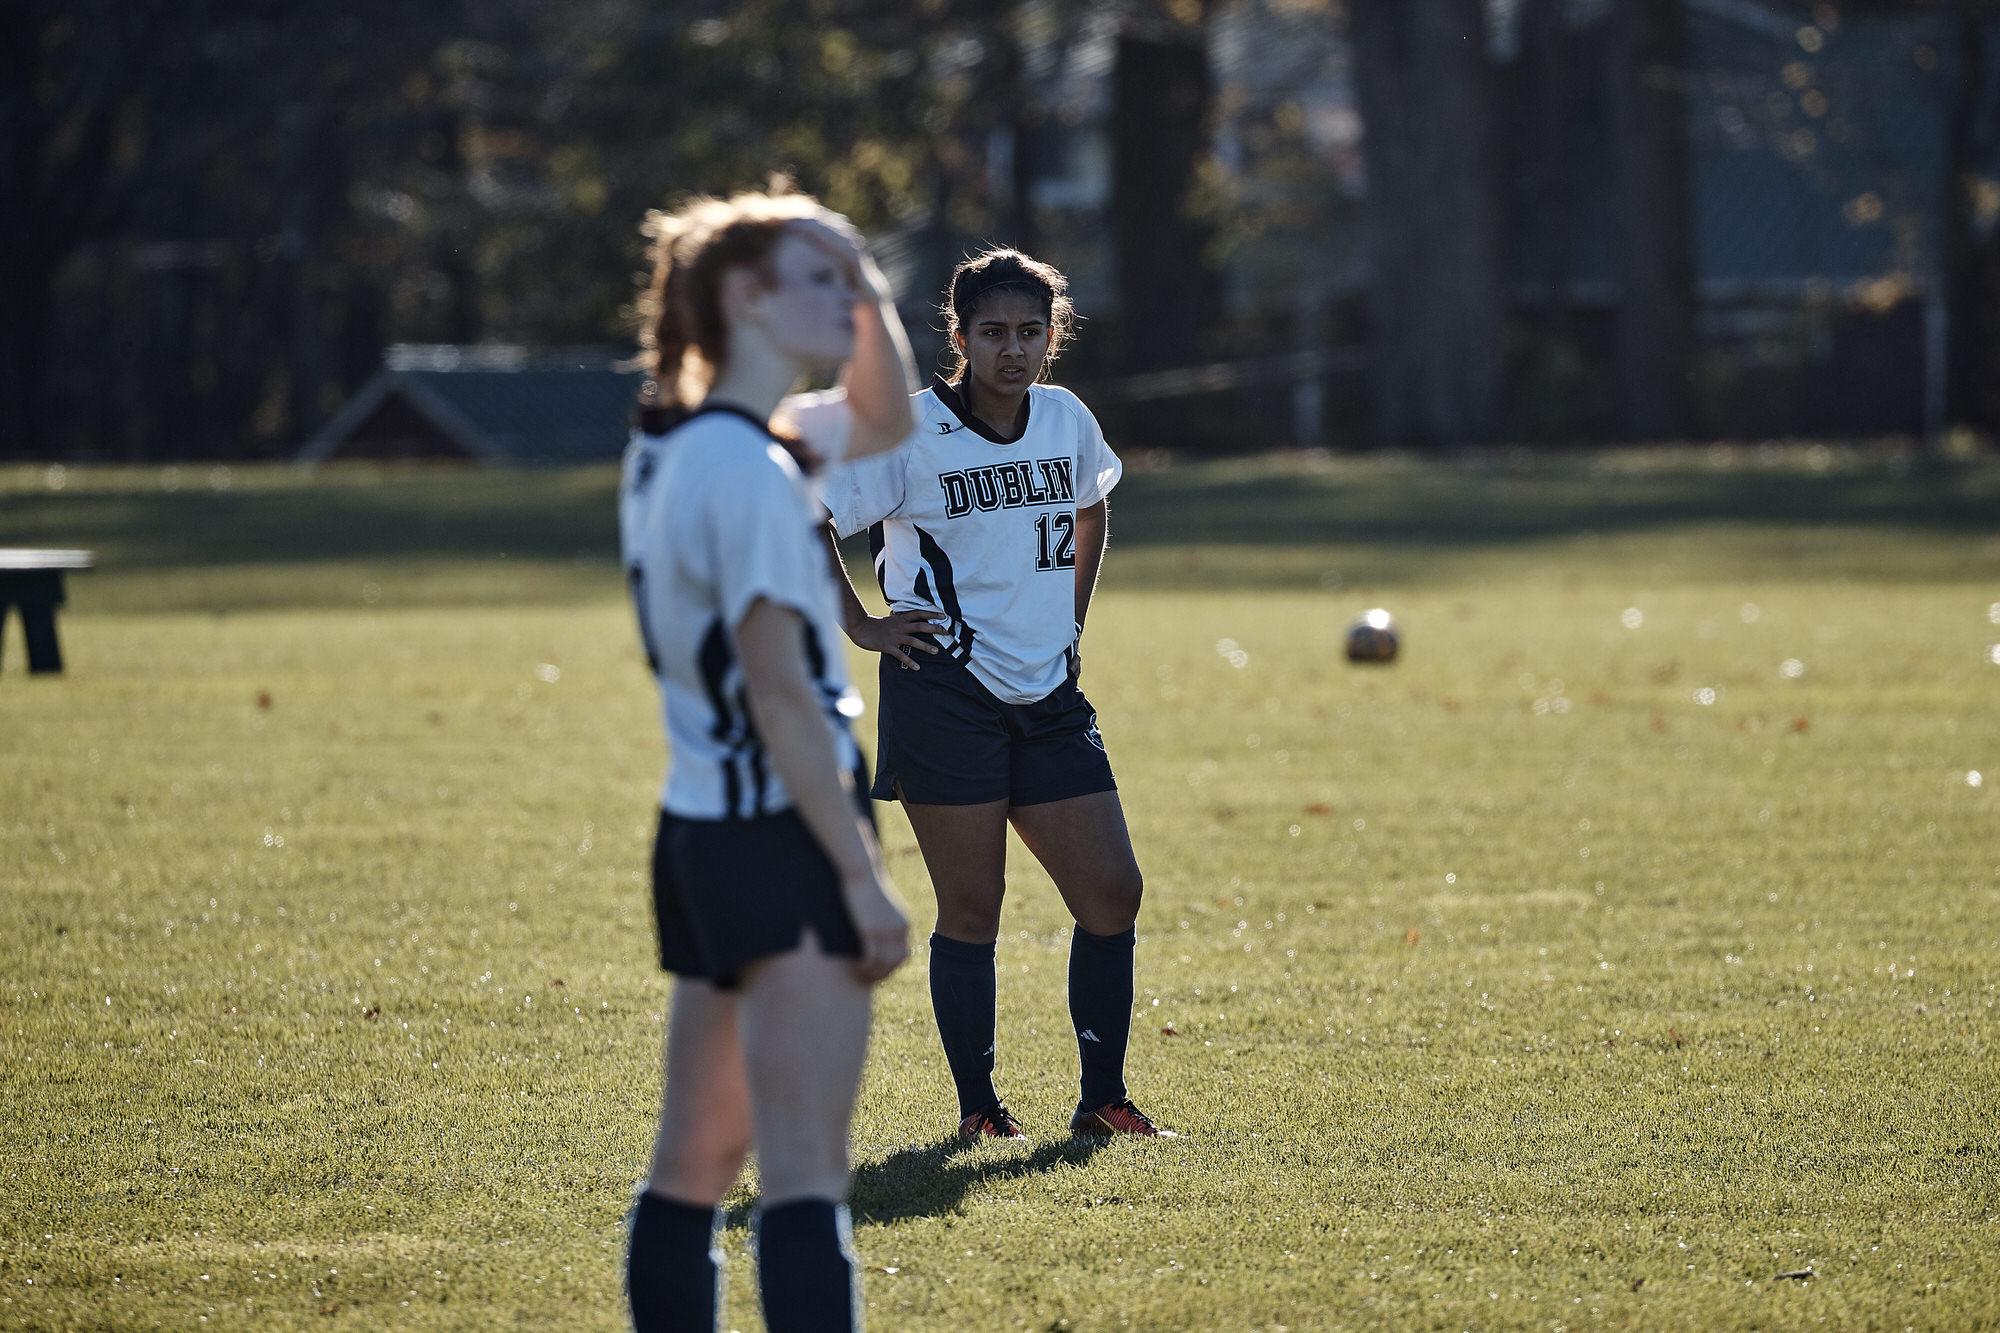 Girls Varsity Soccer vs. Putney School - October 26, 2018 - 028.jpg